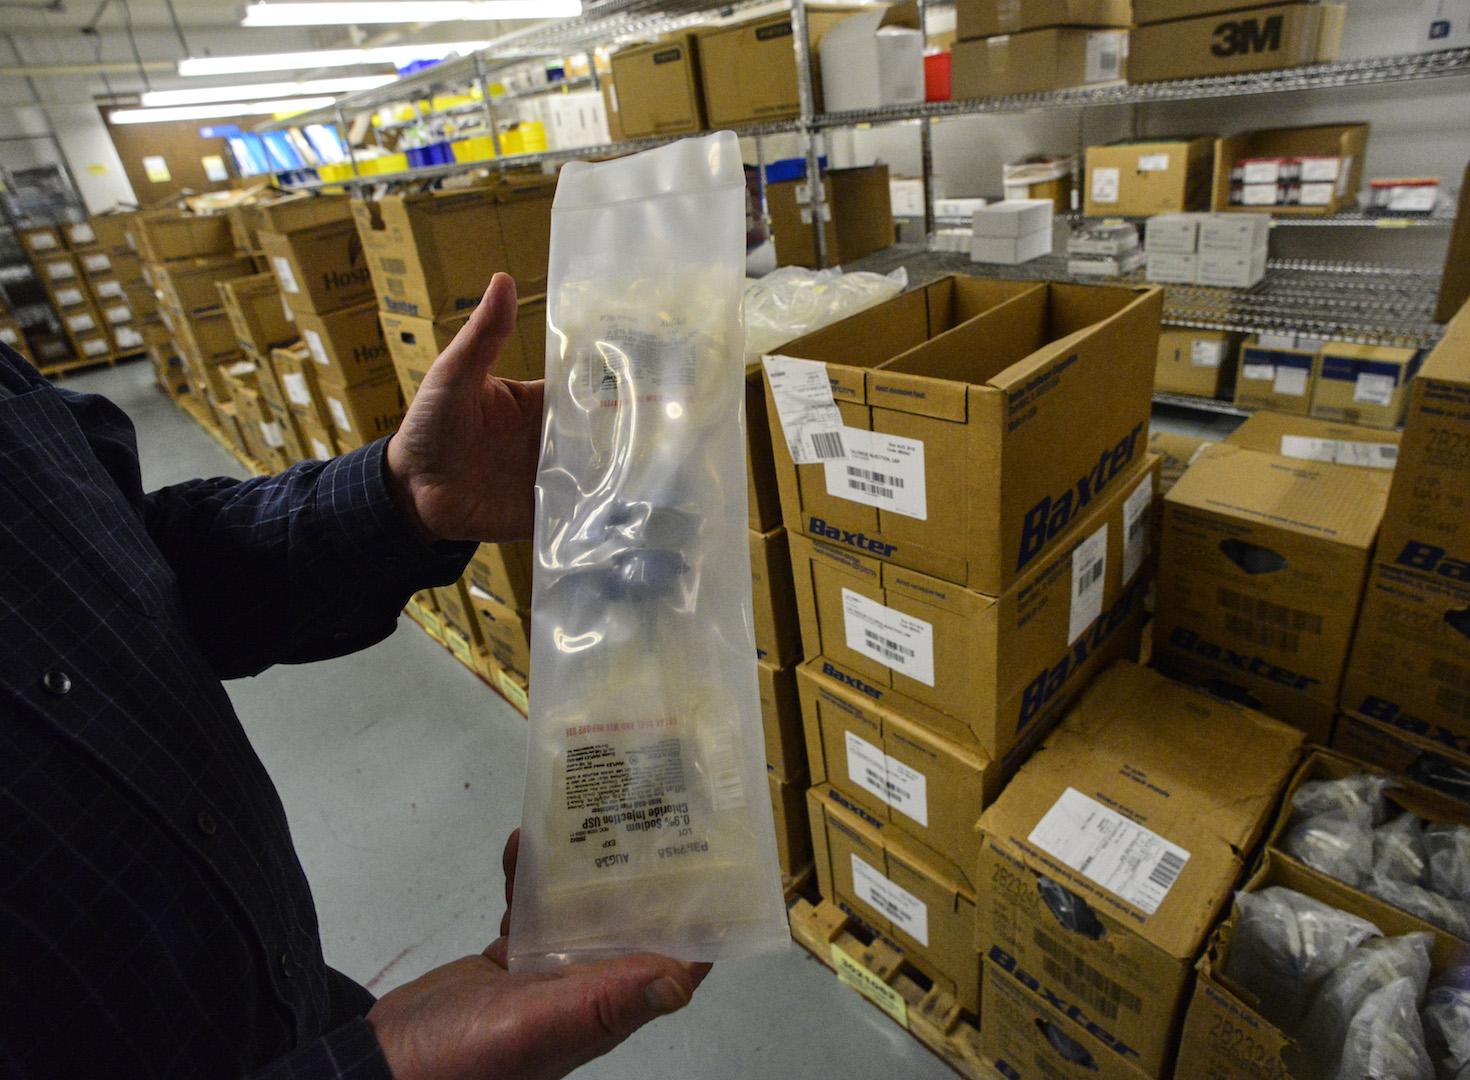 IV shortage being felt nationwide due to Hurricane Maria